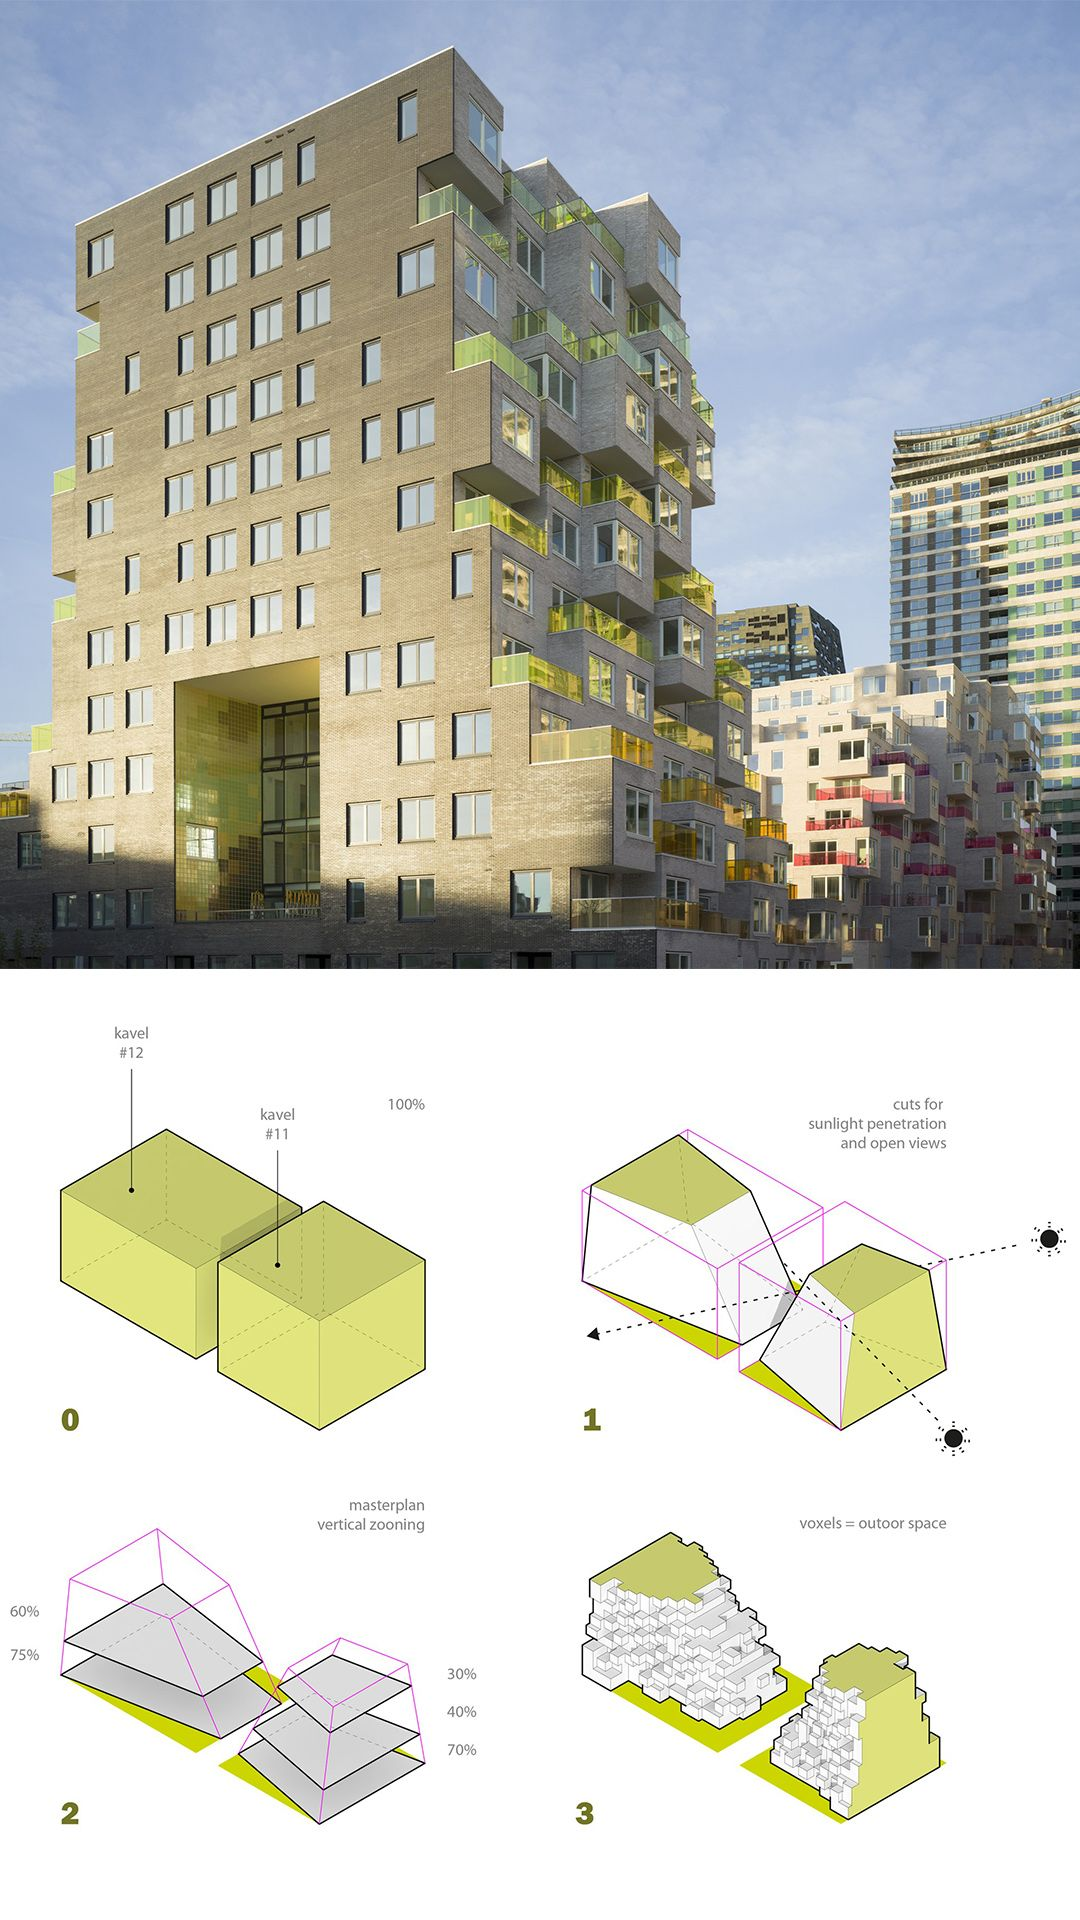 medium resolution of summertime housing art itecture pinterest architecture 3d building structure diagrams 3d building diagram